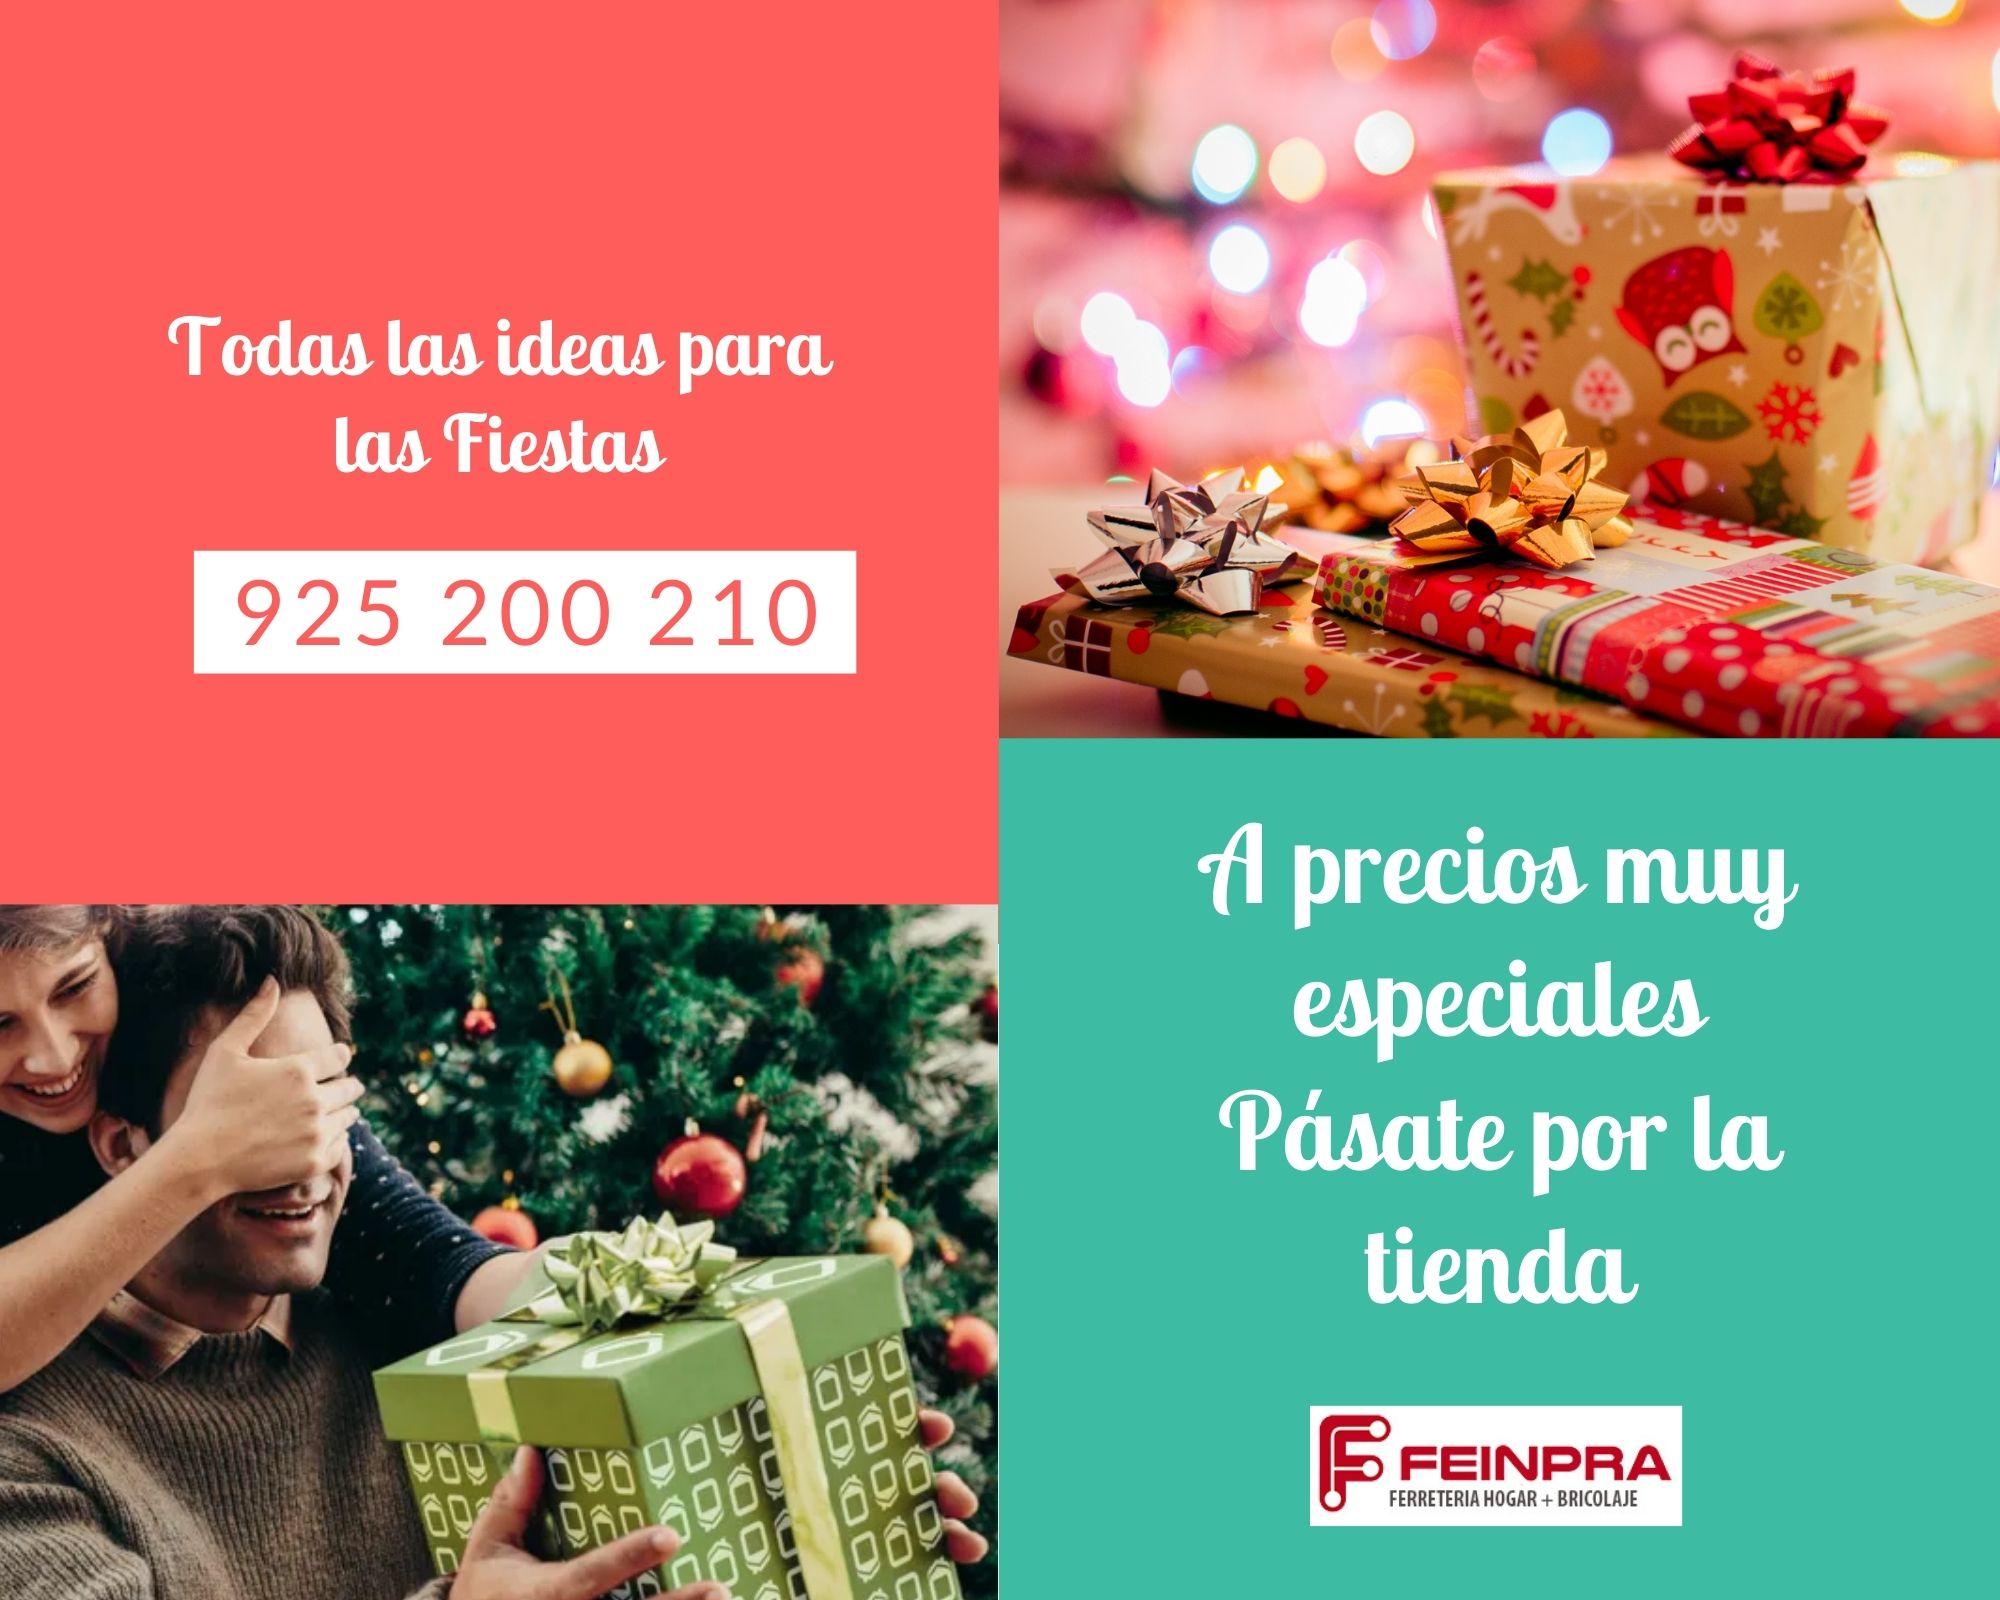 Feinpra Ofertas Navidad 2020